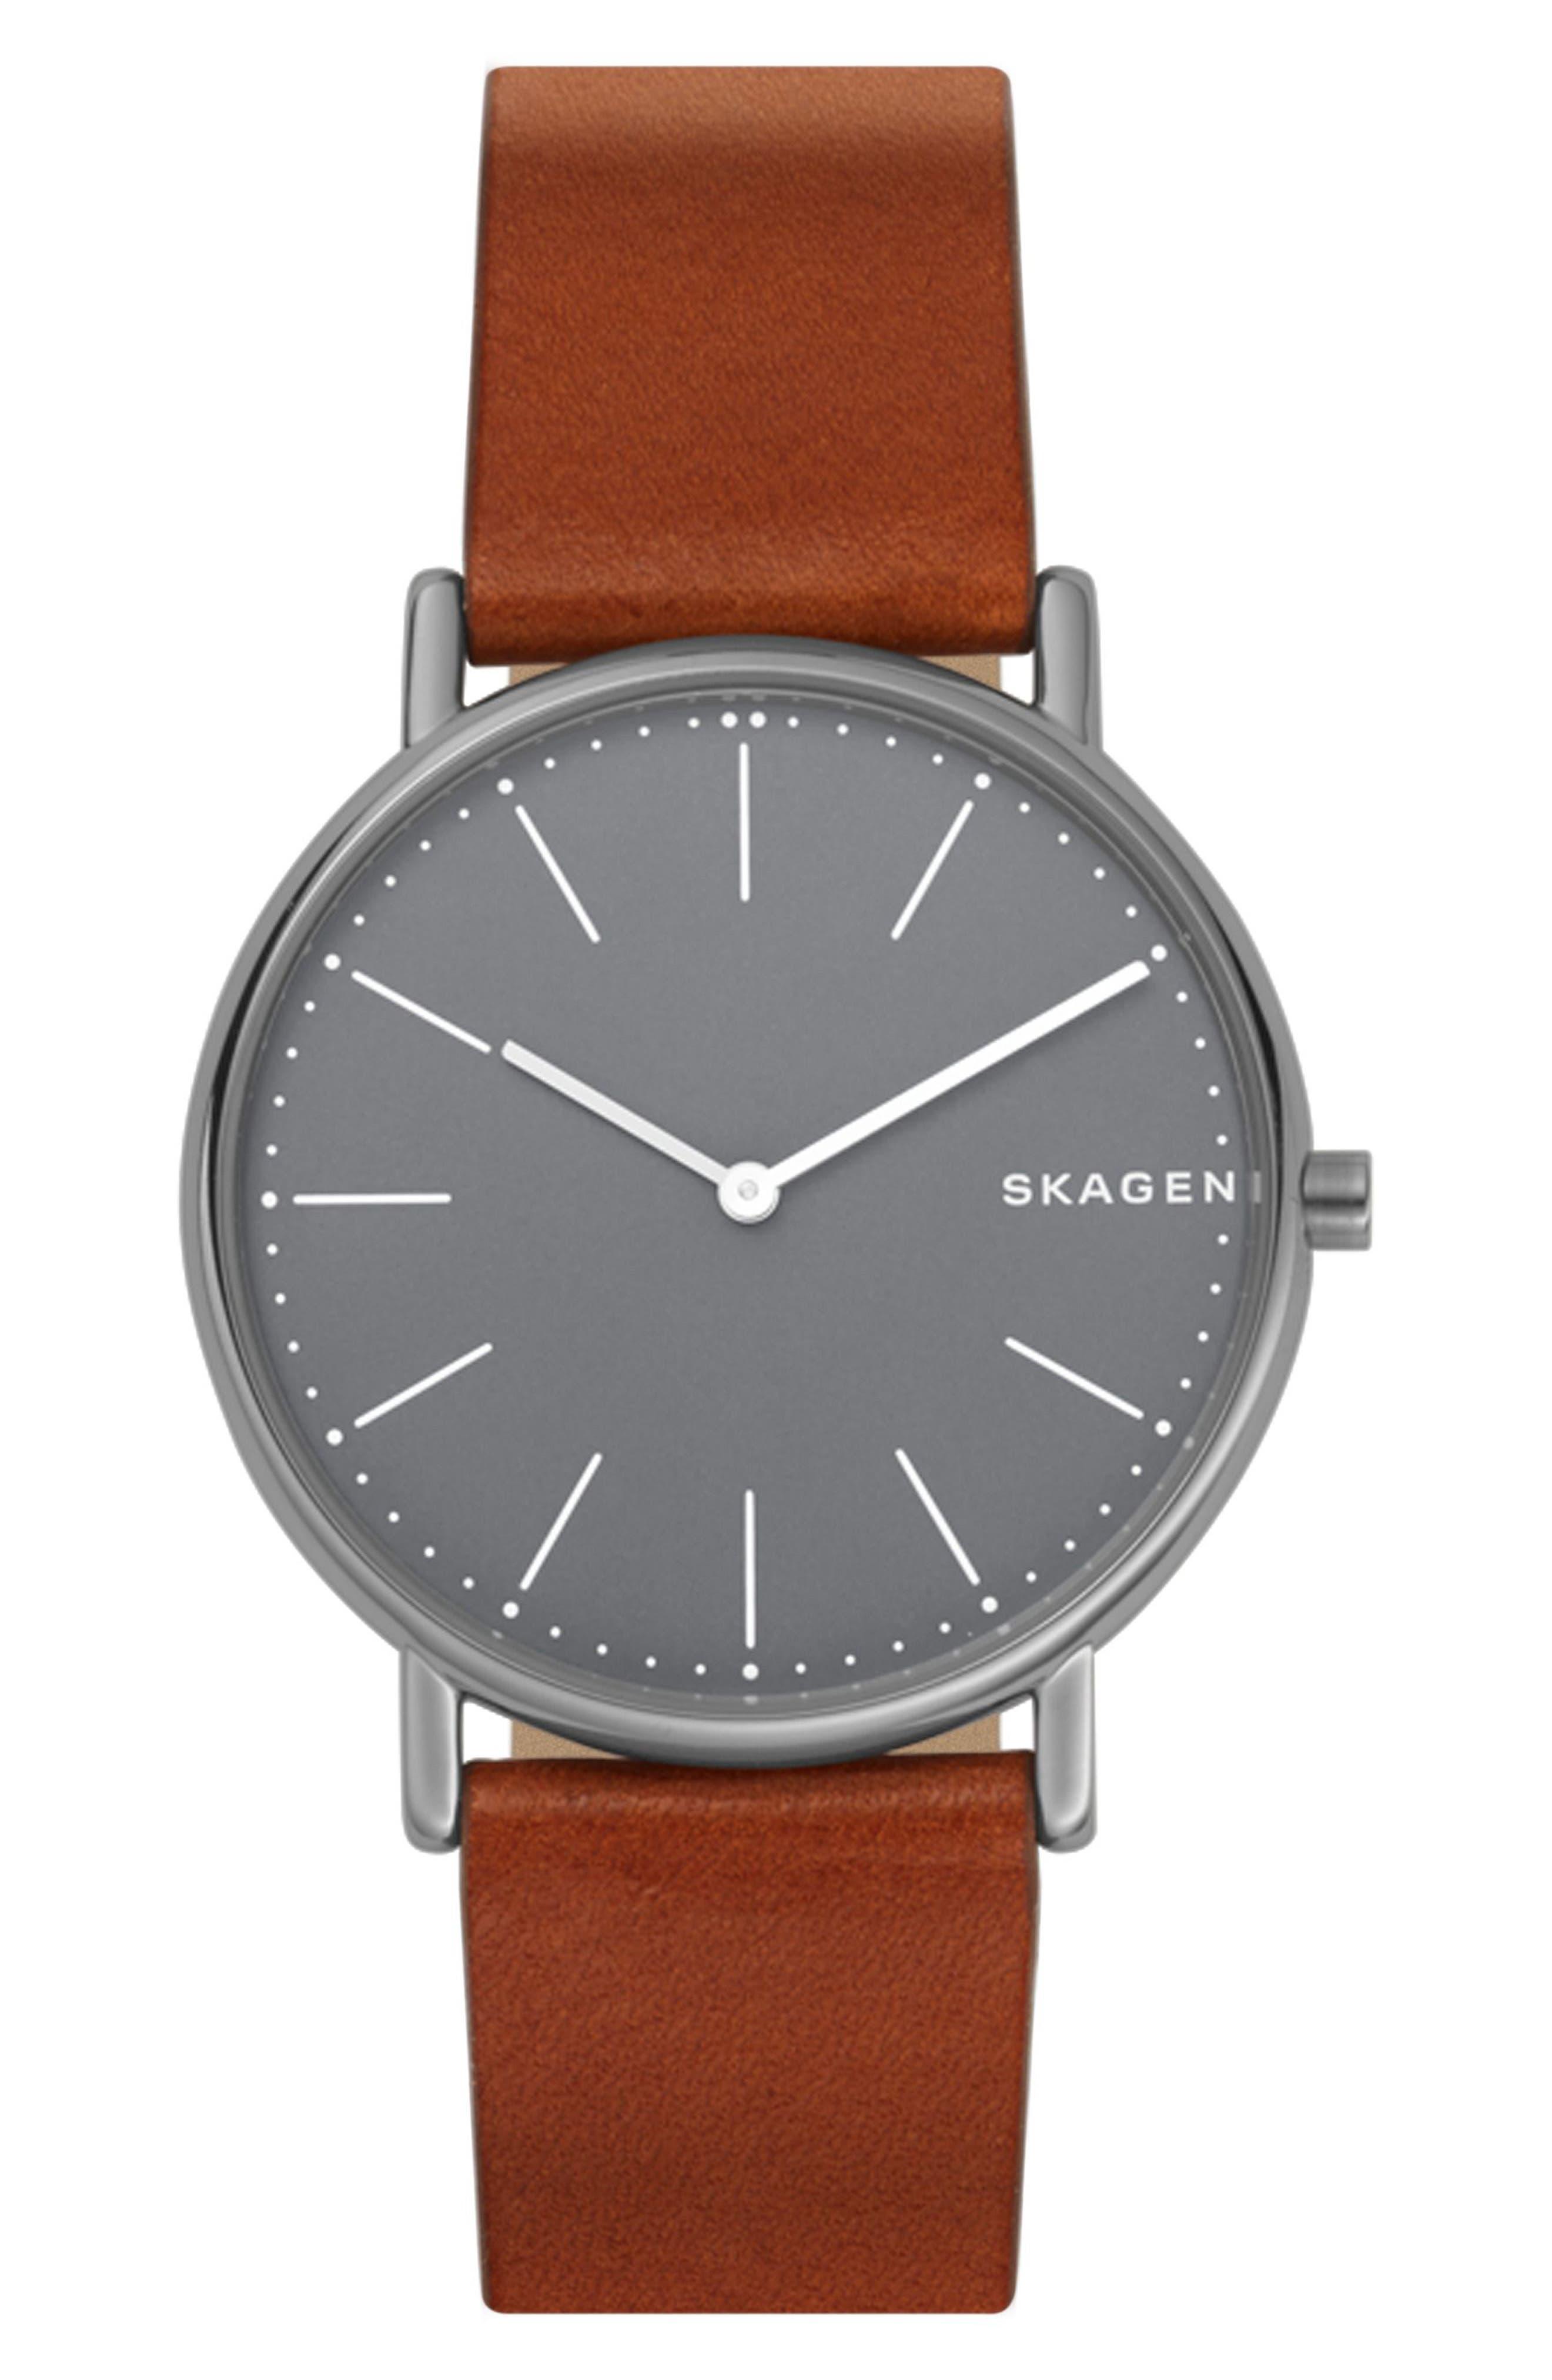 SKAGEN Signatur Slim Leather Strap Watch, 40mm, Main, color, BROWN/ GREY